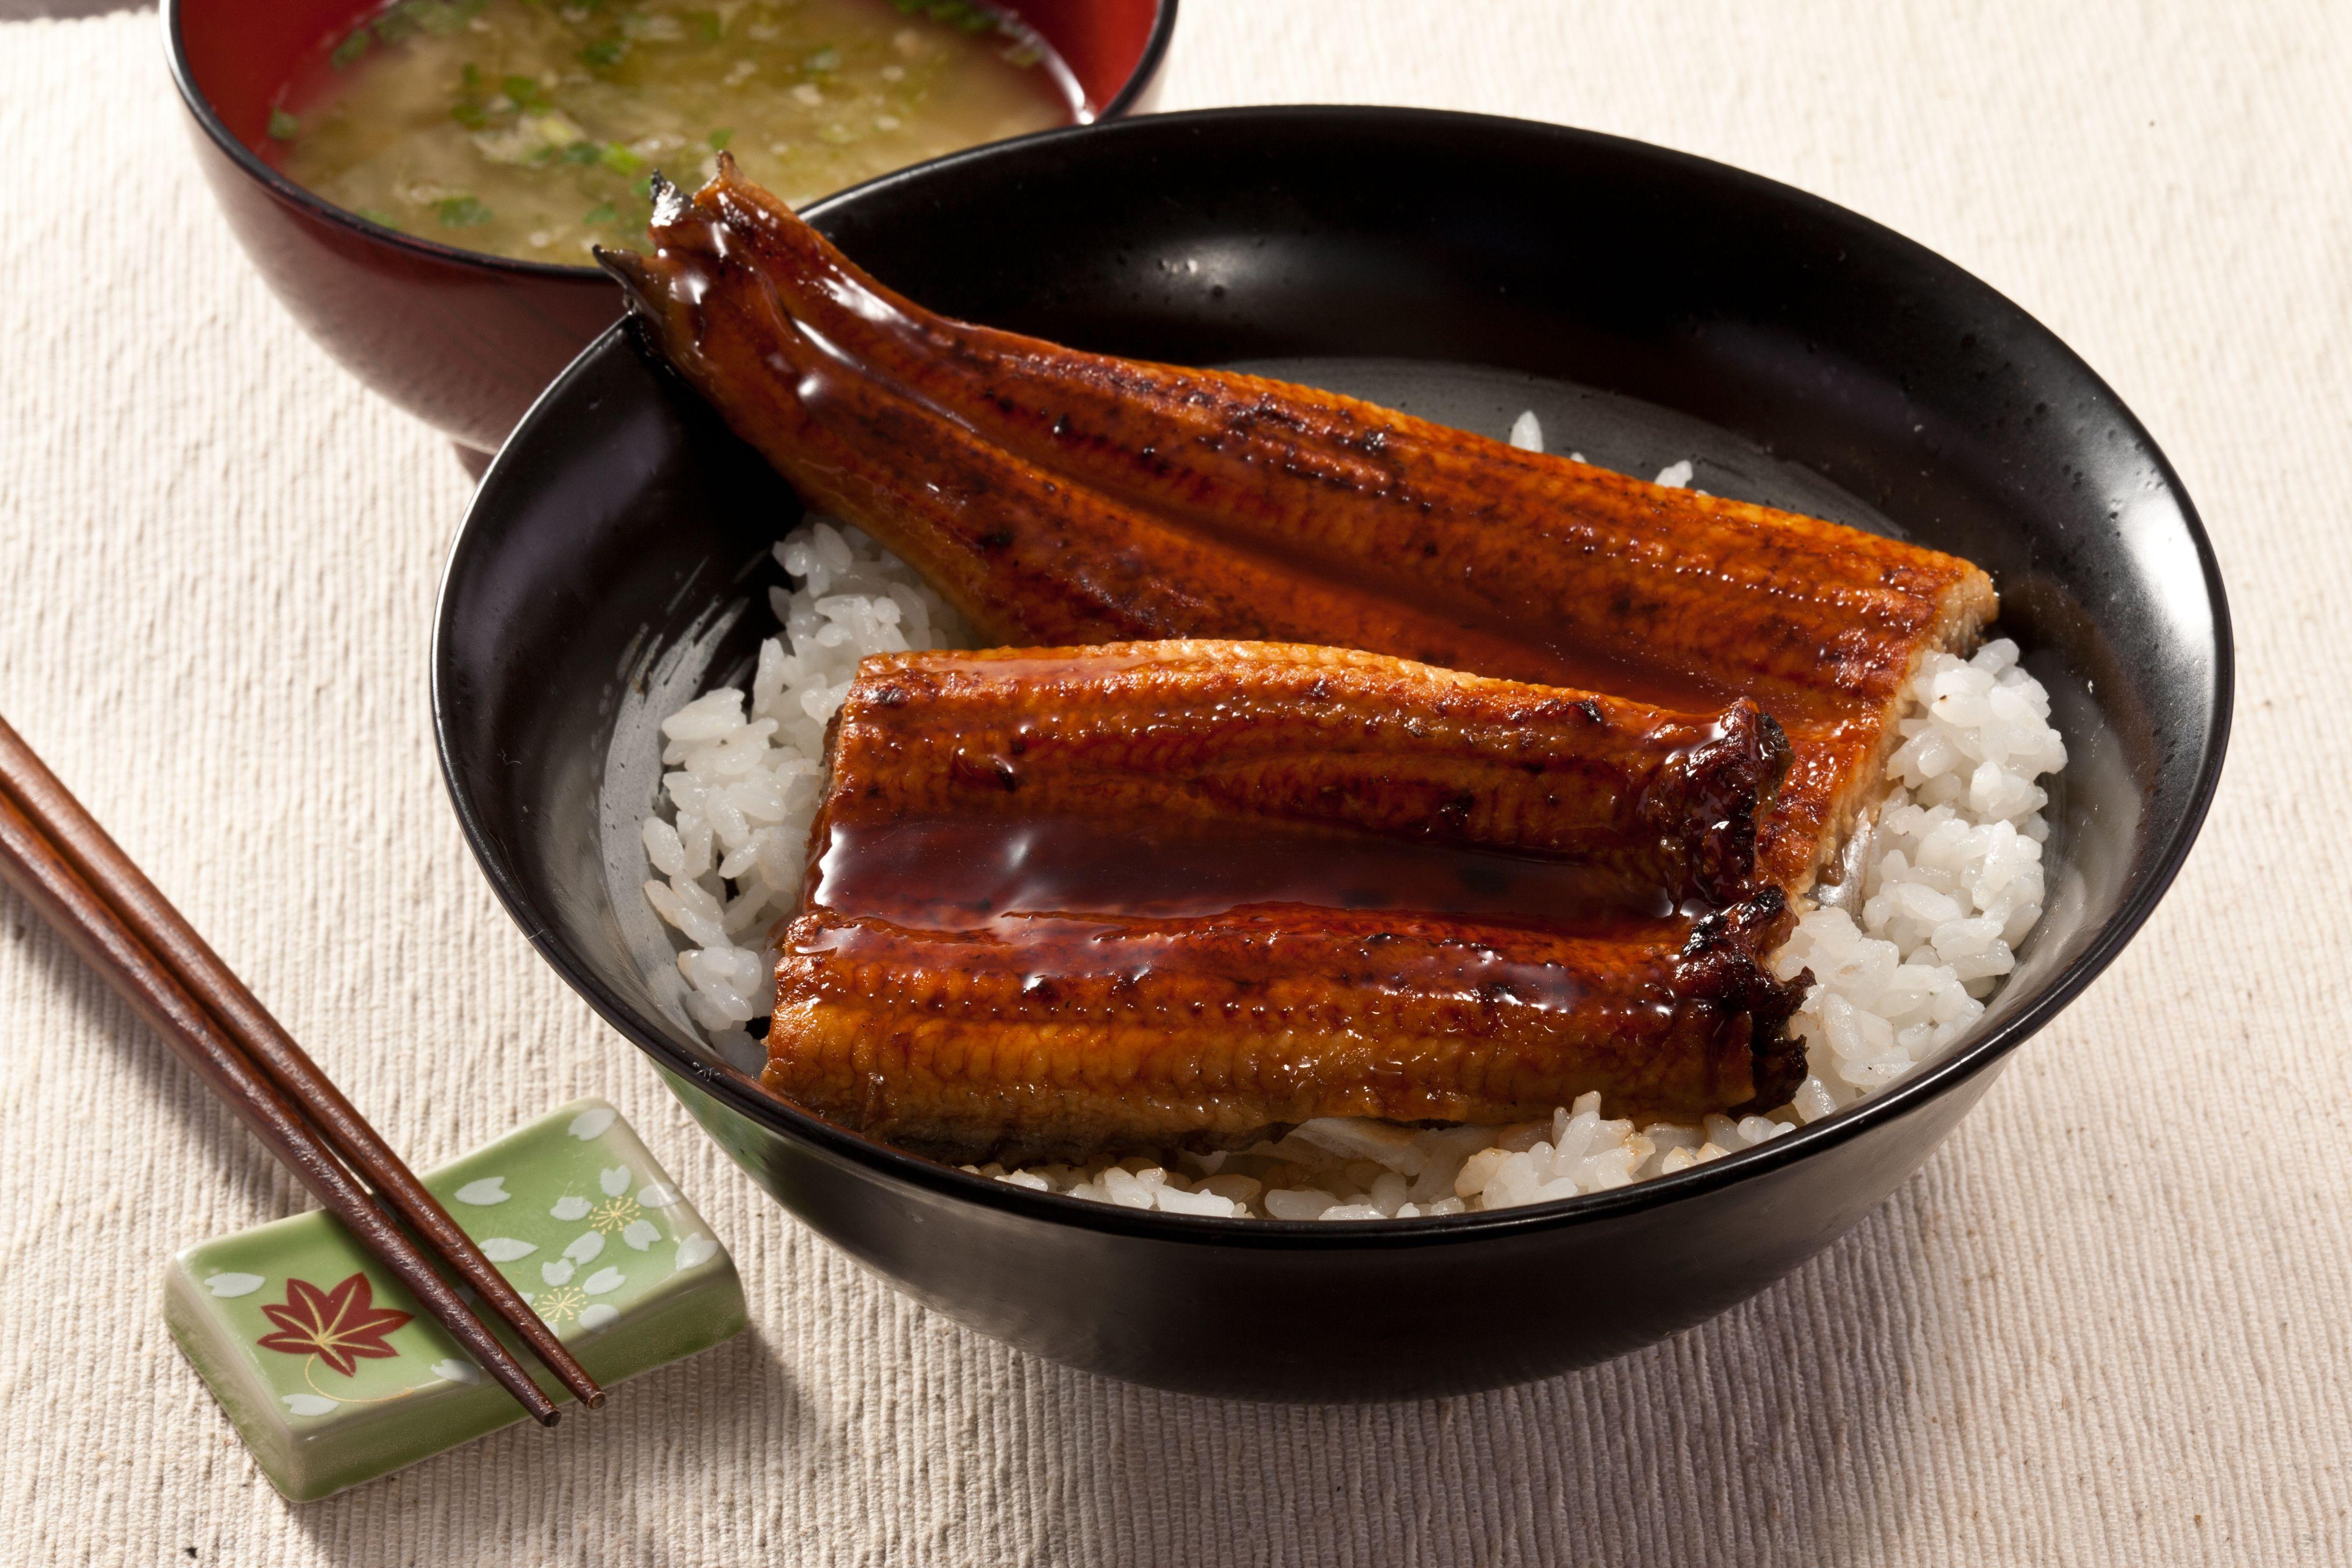 Japanese Broiled Unagi Eel With Rice